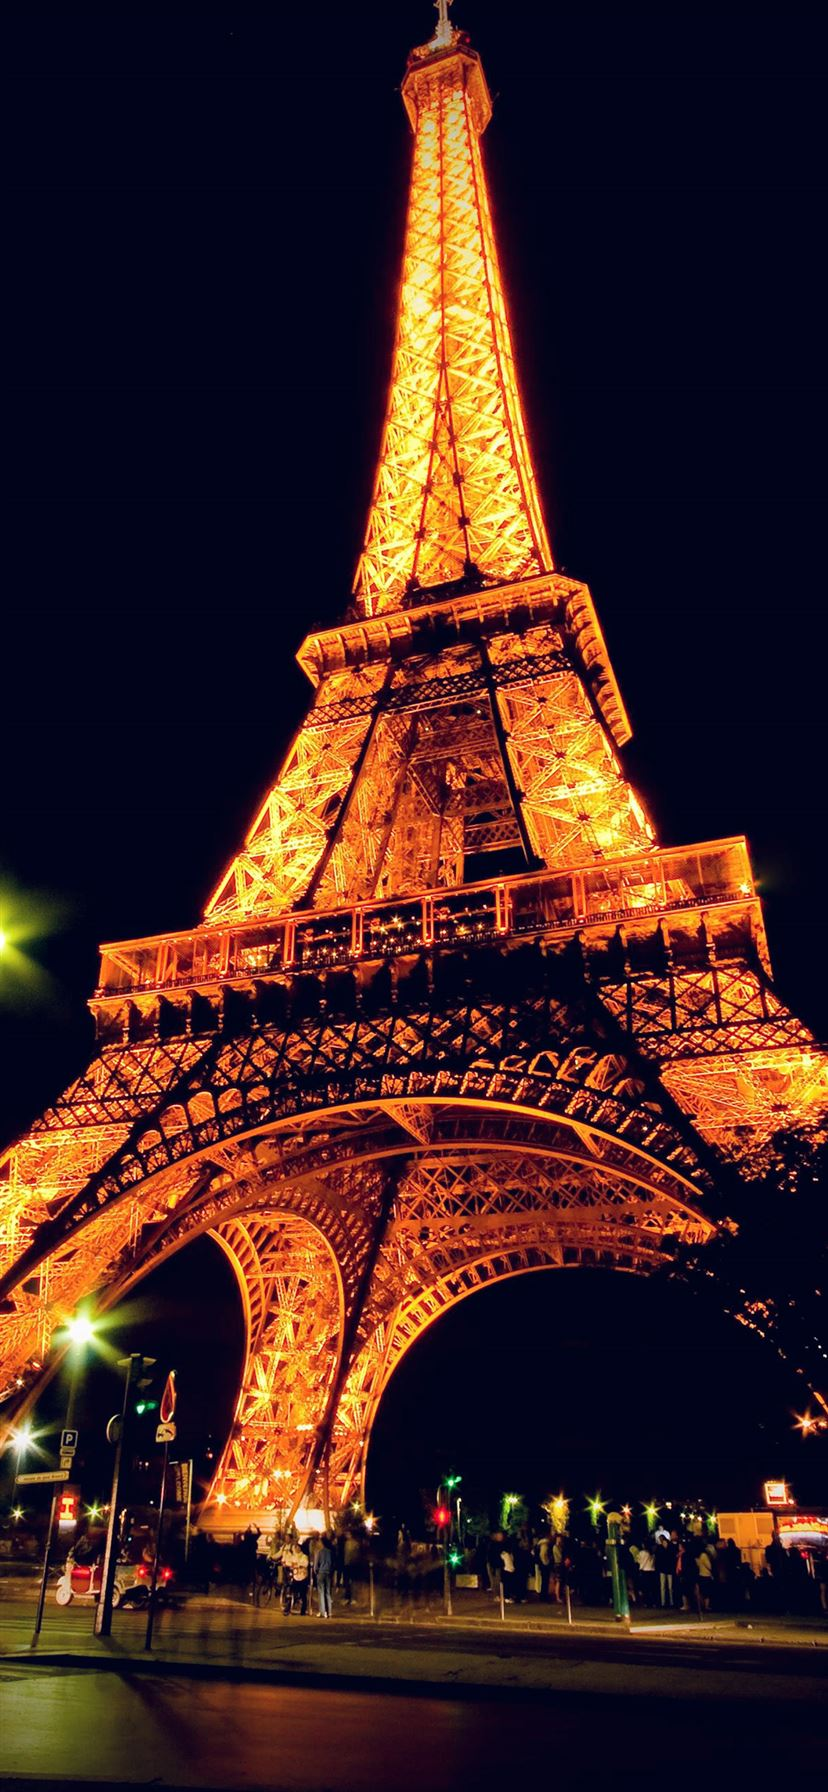 Eiffel Tower Paris Night Art Illustration Iphone 11